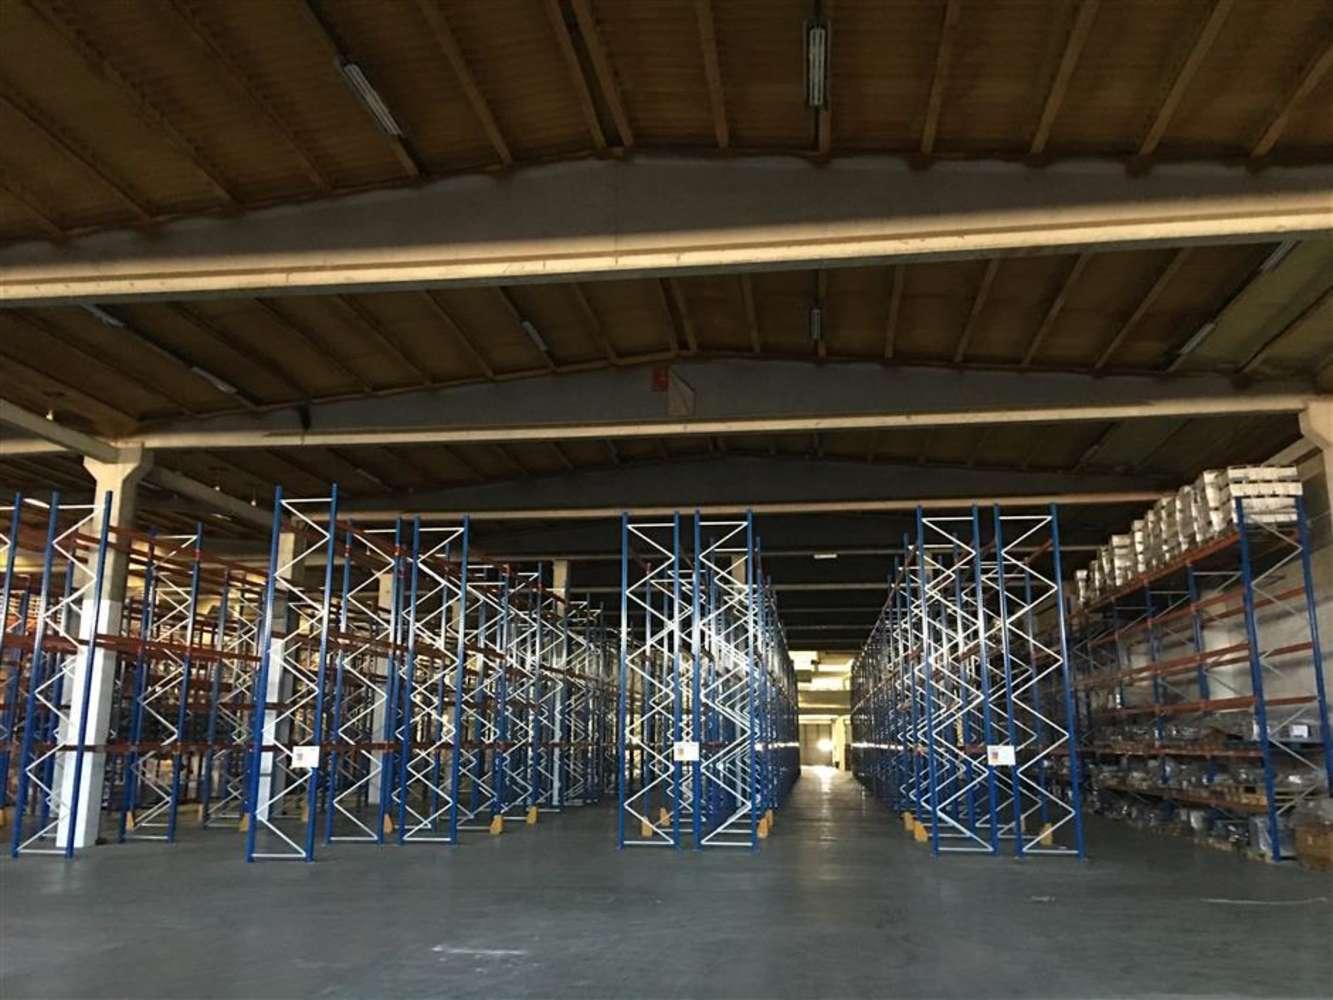 Naves industriales y logísticas Sant fruitós de bages, 08272 - Nave Logística - B0425 - PI SANT ISIDRE - 8725